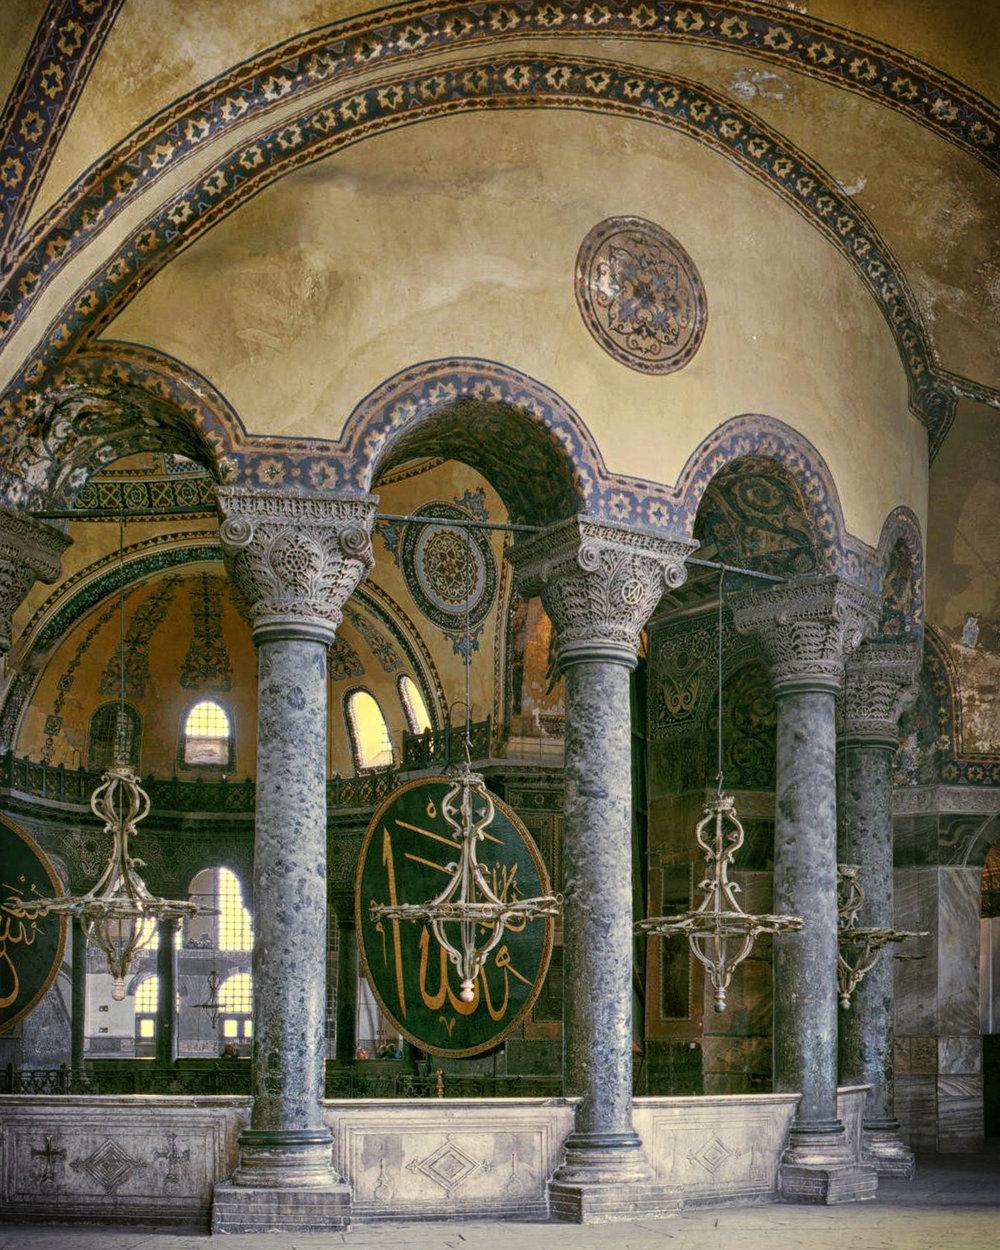 Mosque - Istanbul, Turkey 1997